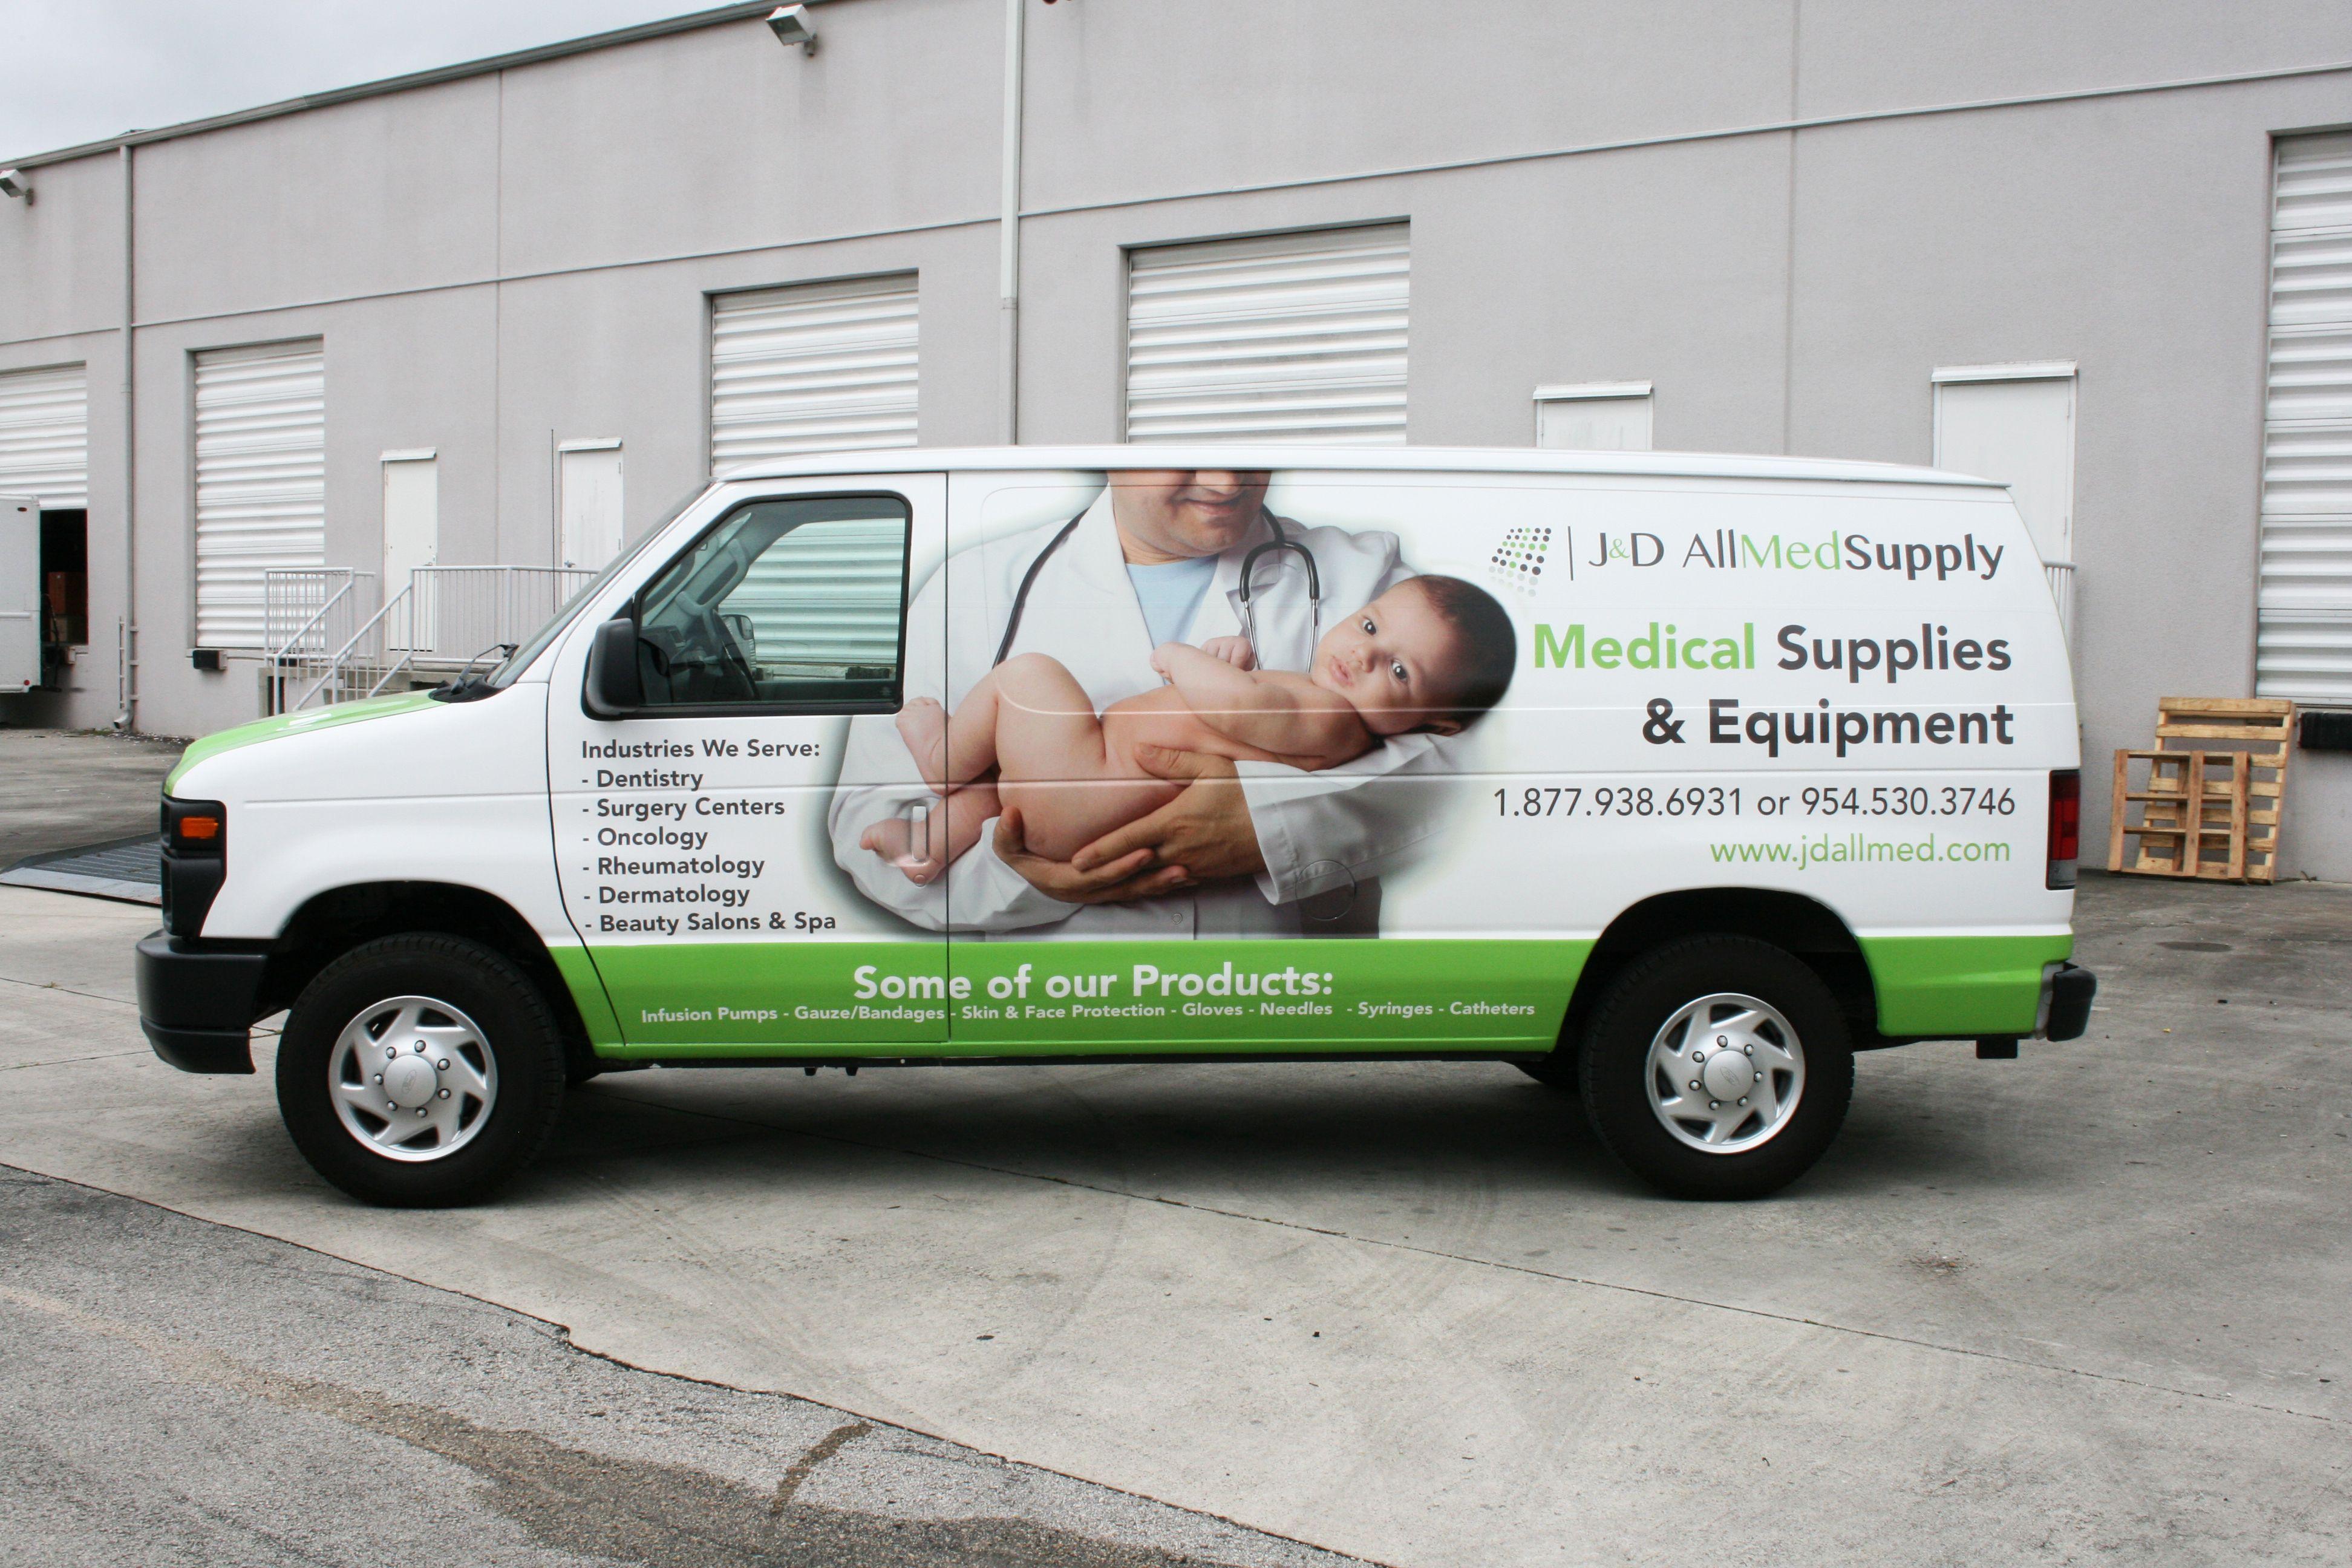 3m Vinyl Vehicle Wrap Sunrise Fort Lauderdale Florida For J D Allmed Supply Medical Supply Delivery Http Carwrapsolut Car Wrap Truck Lettering Boat Wraps